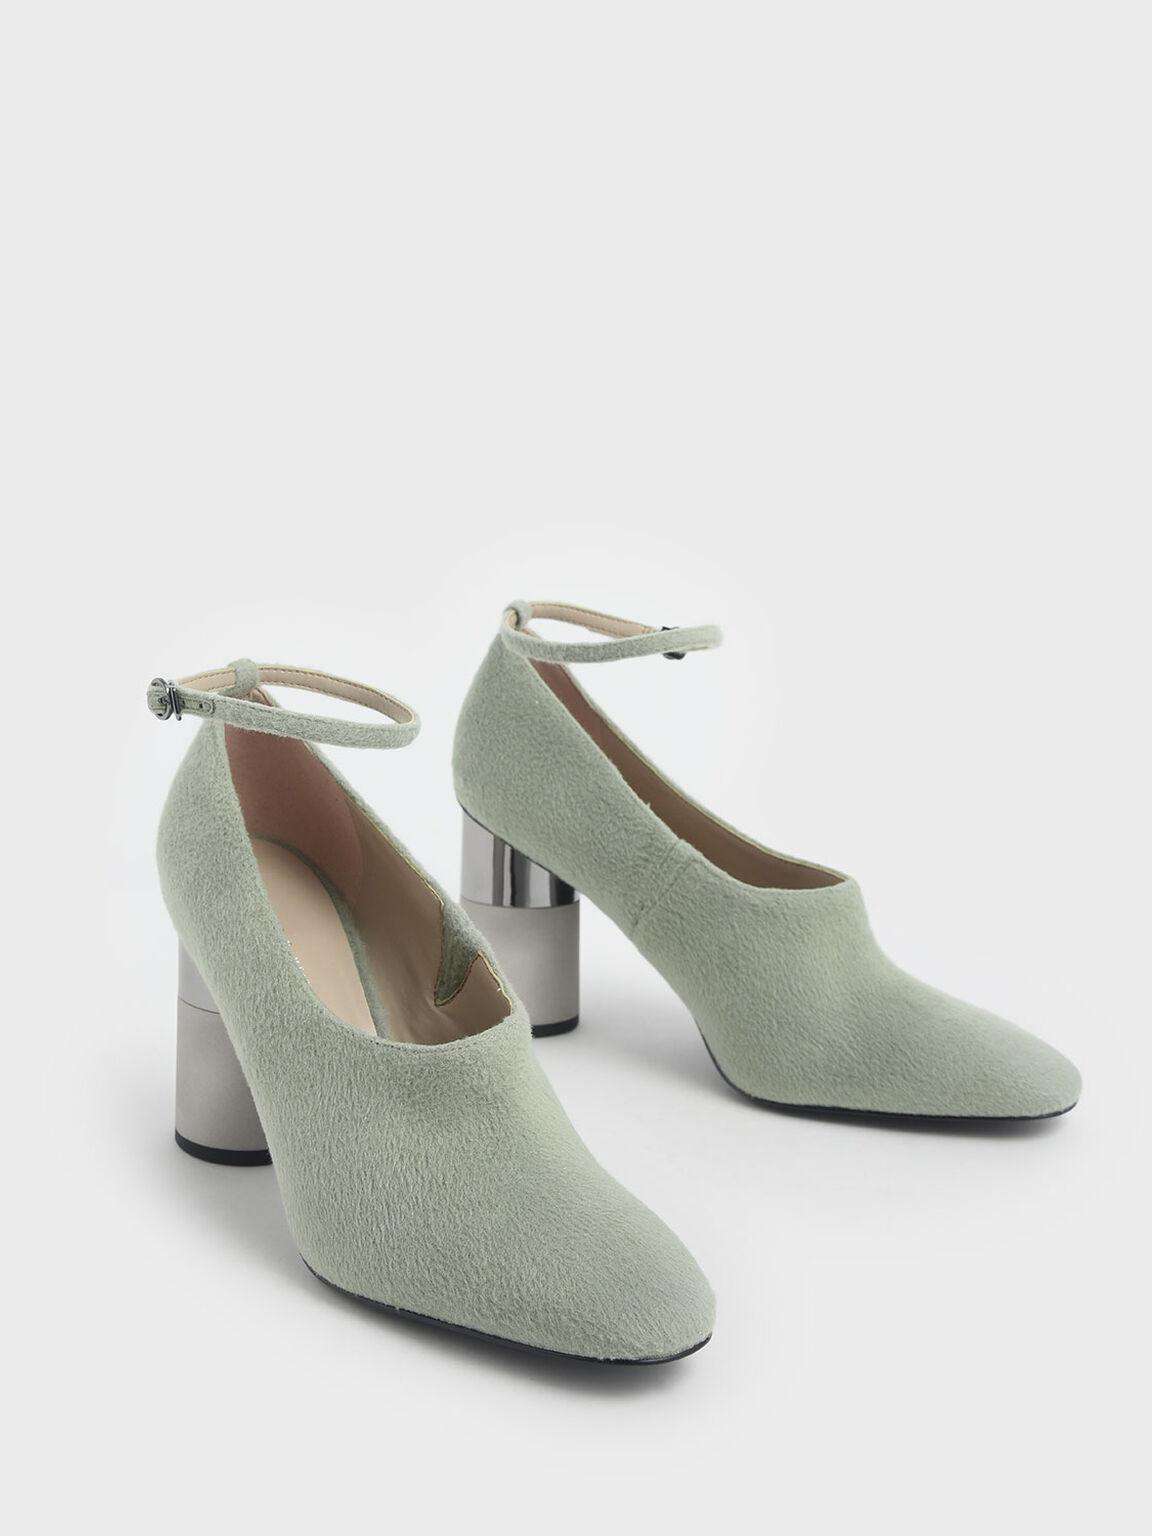 Ankle Strap Concrete Heel Pump, Sage Green, hi-res